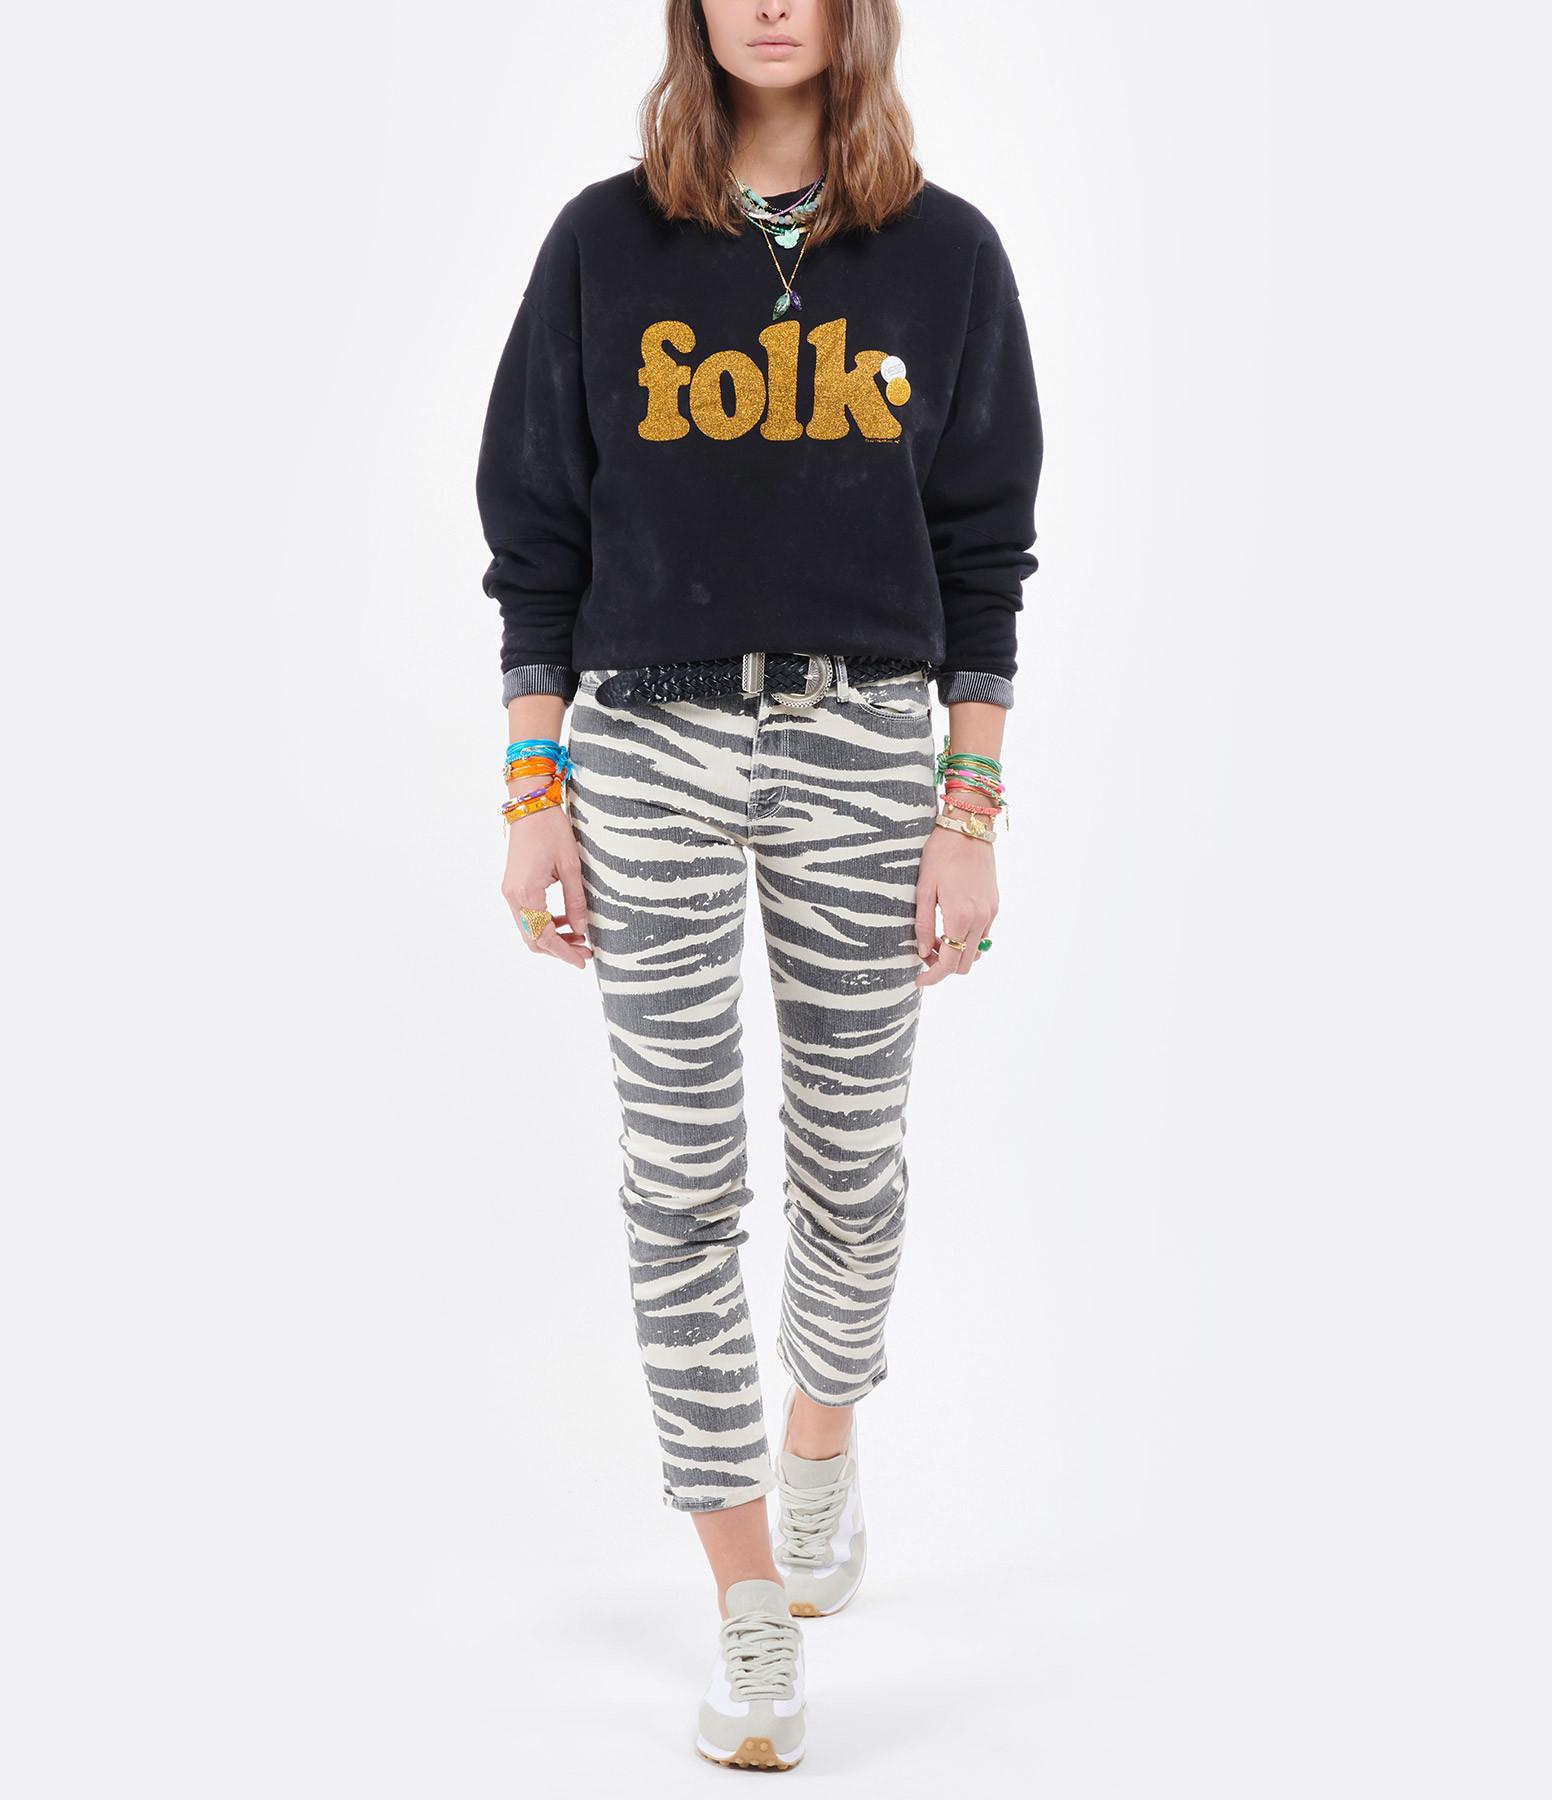 NEWTONE - Sweatshirt Roller Folk Coton Noir